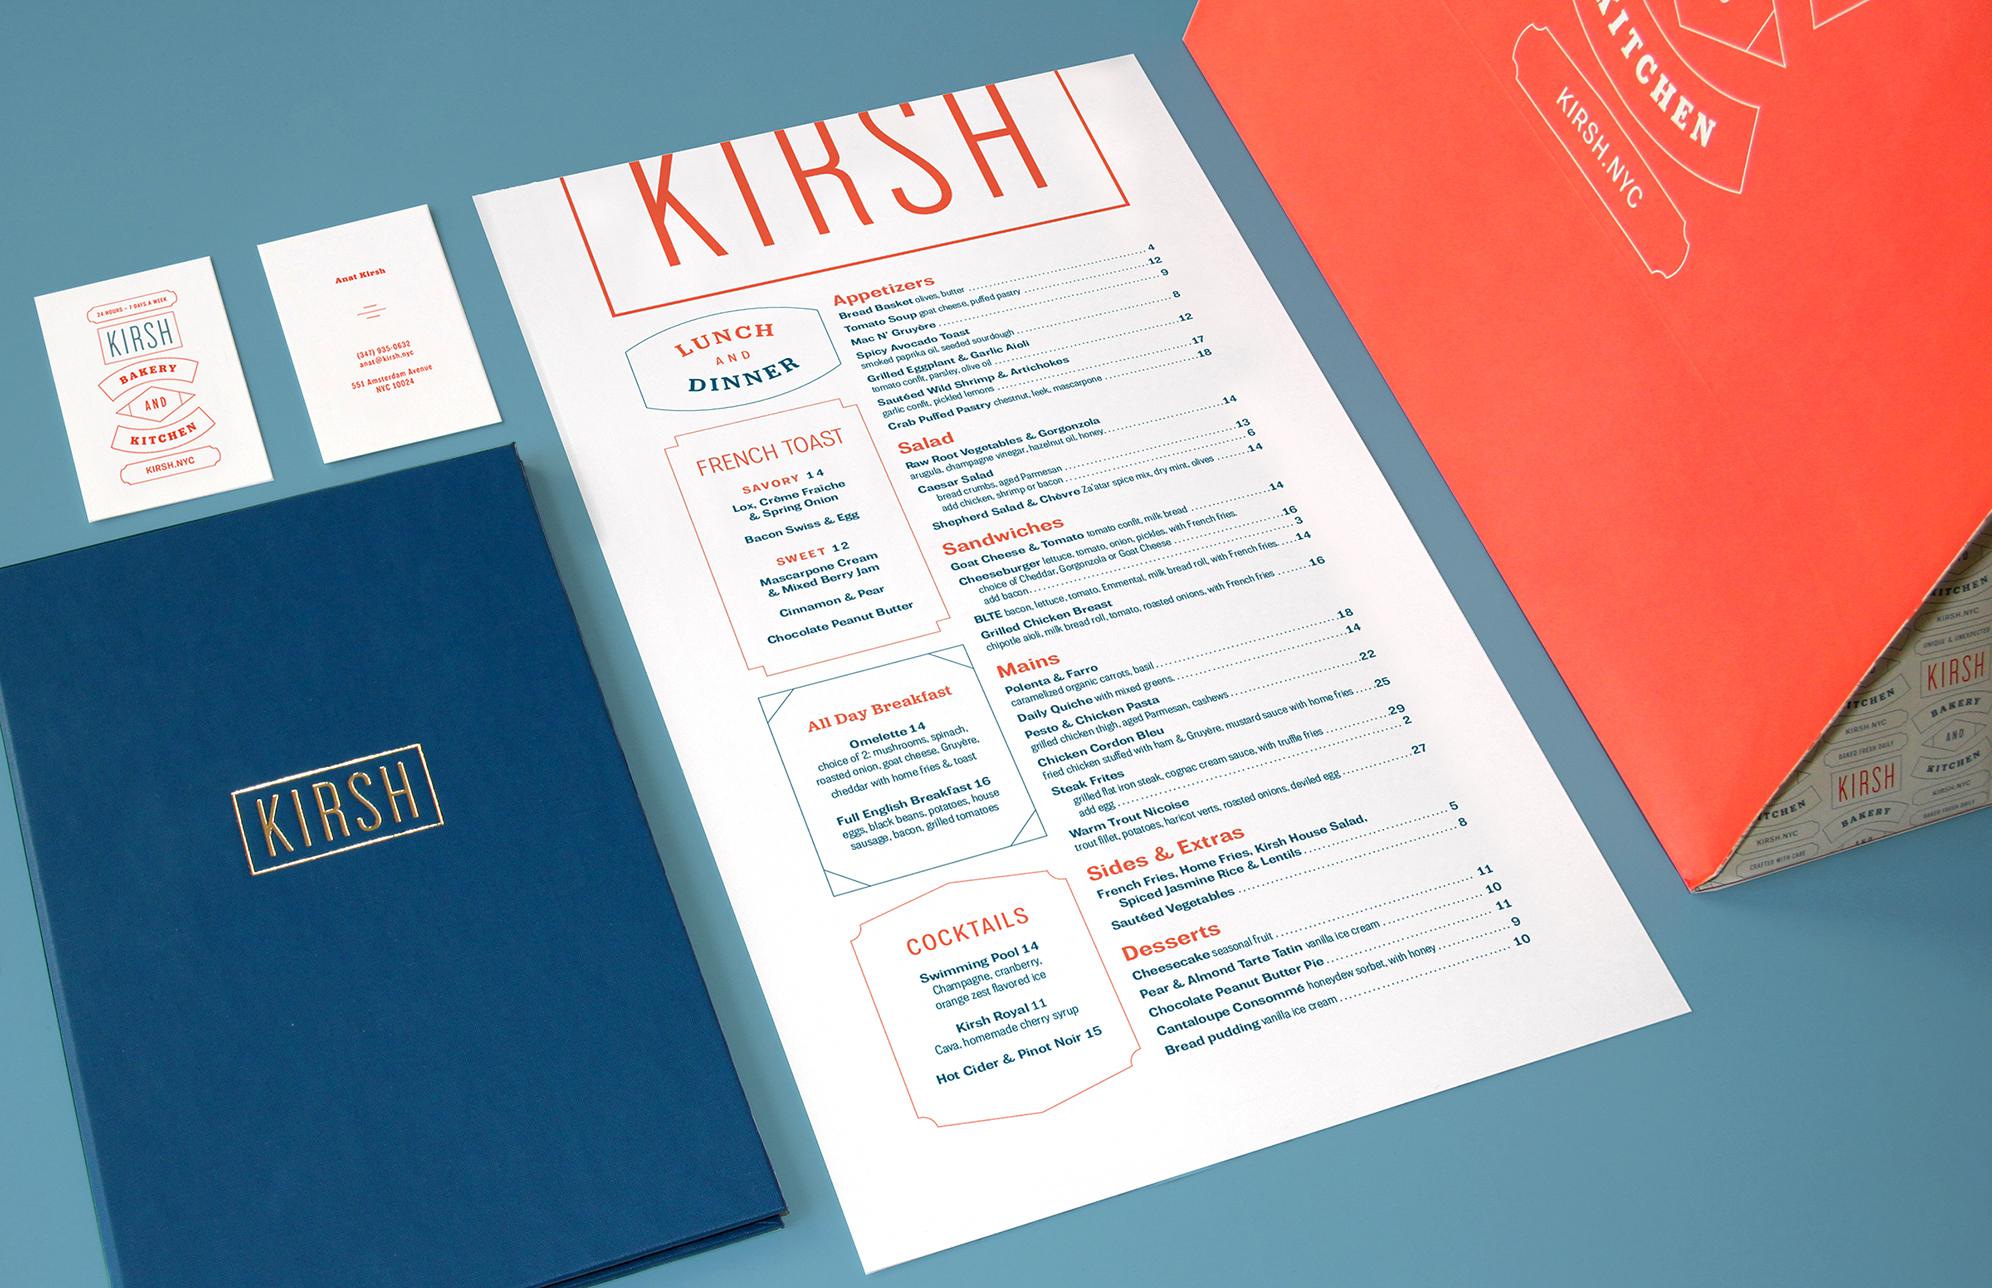 kirsh_system_cs.jpeg